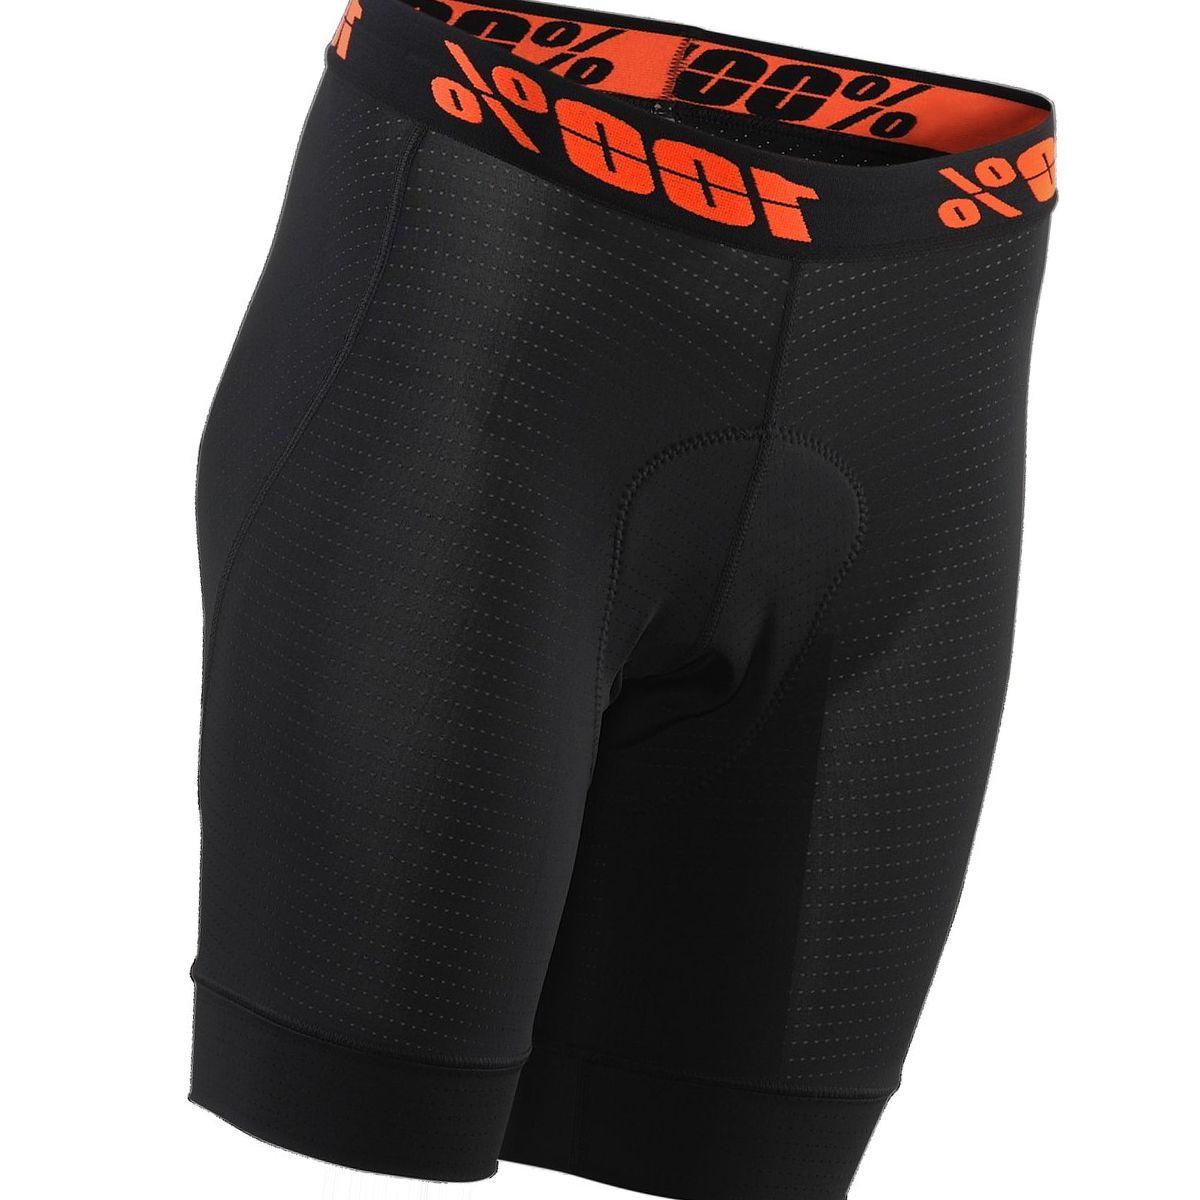 100% Crux Liner Short - Women's